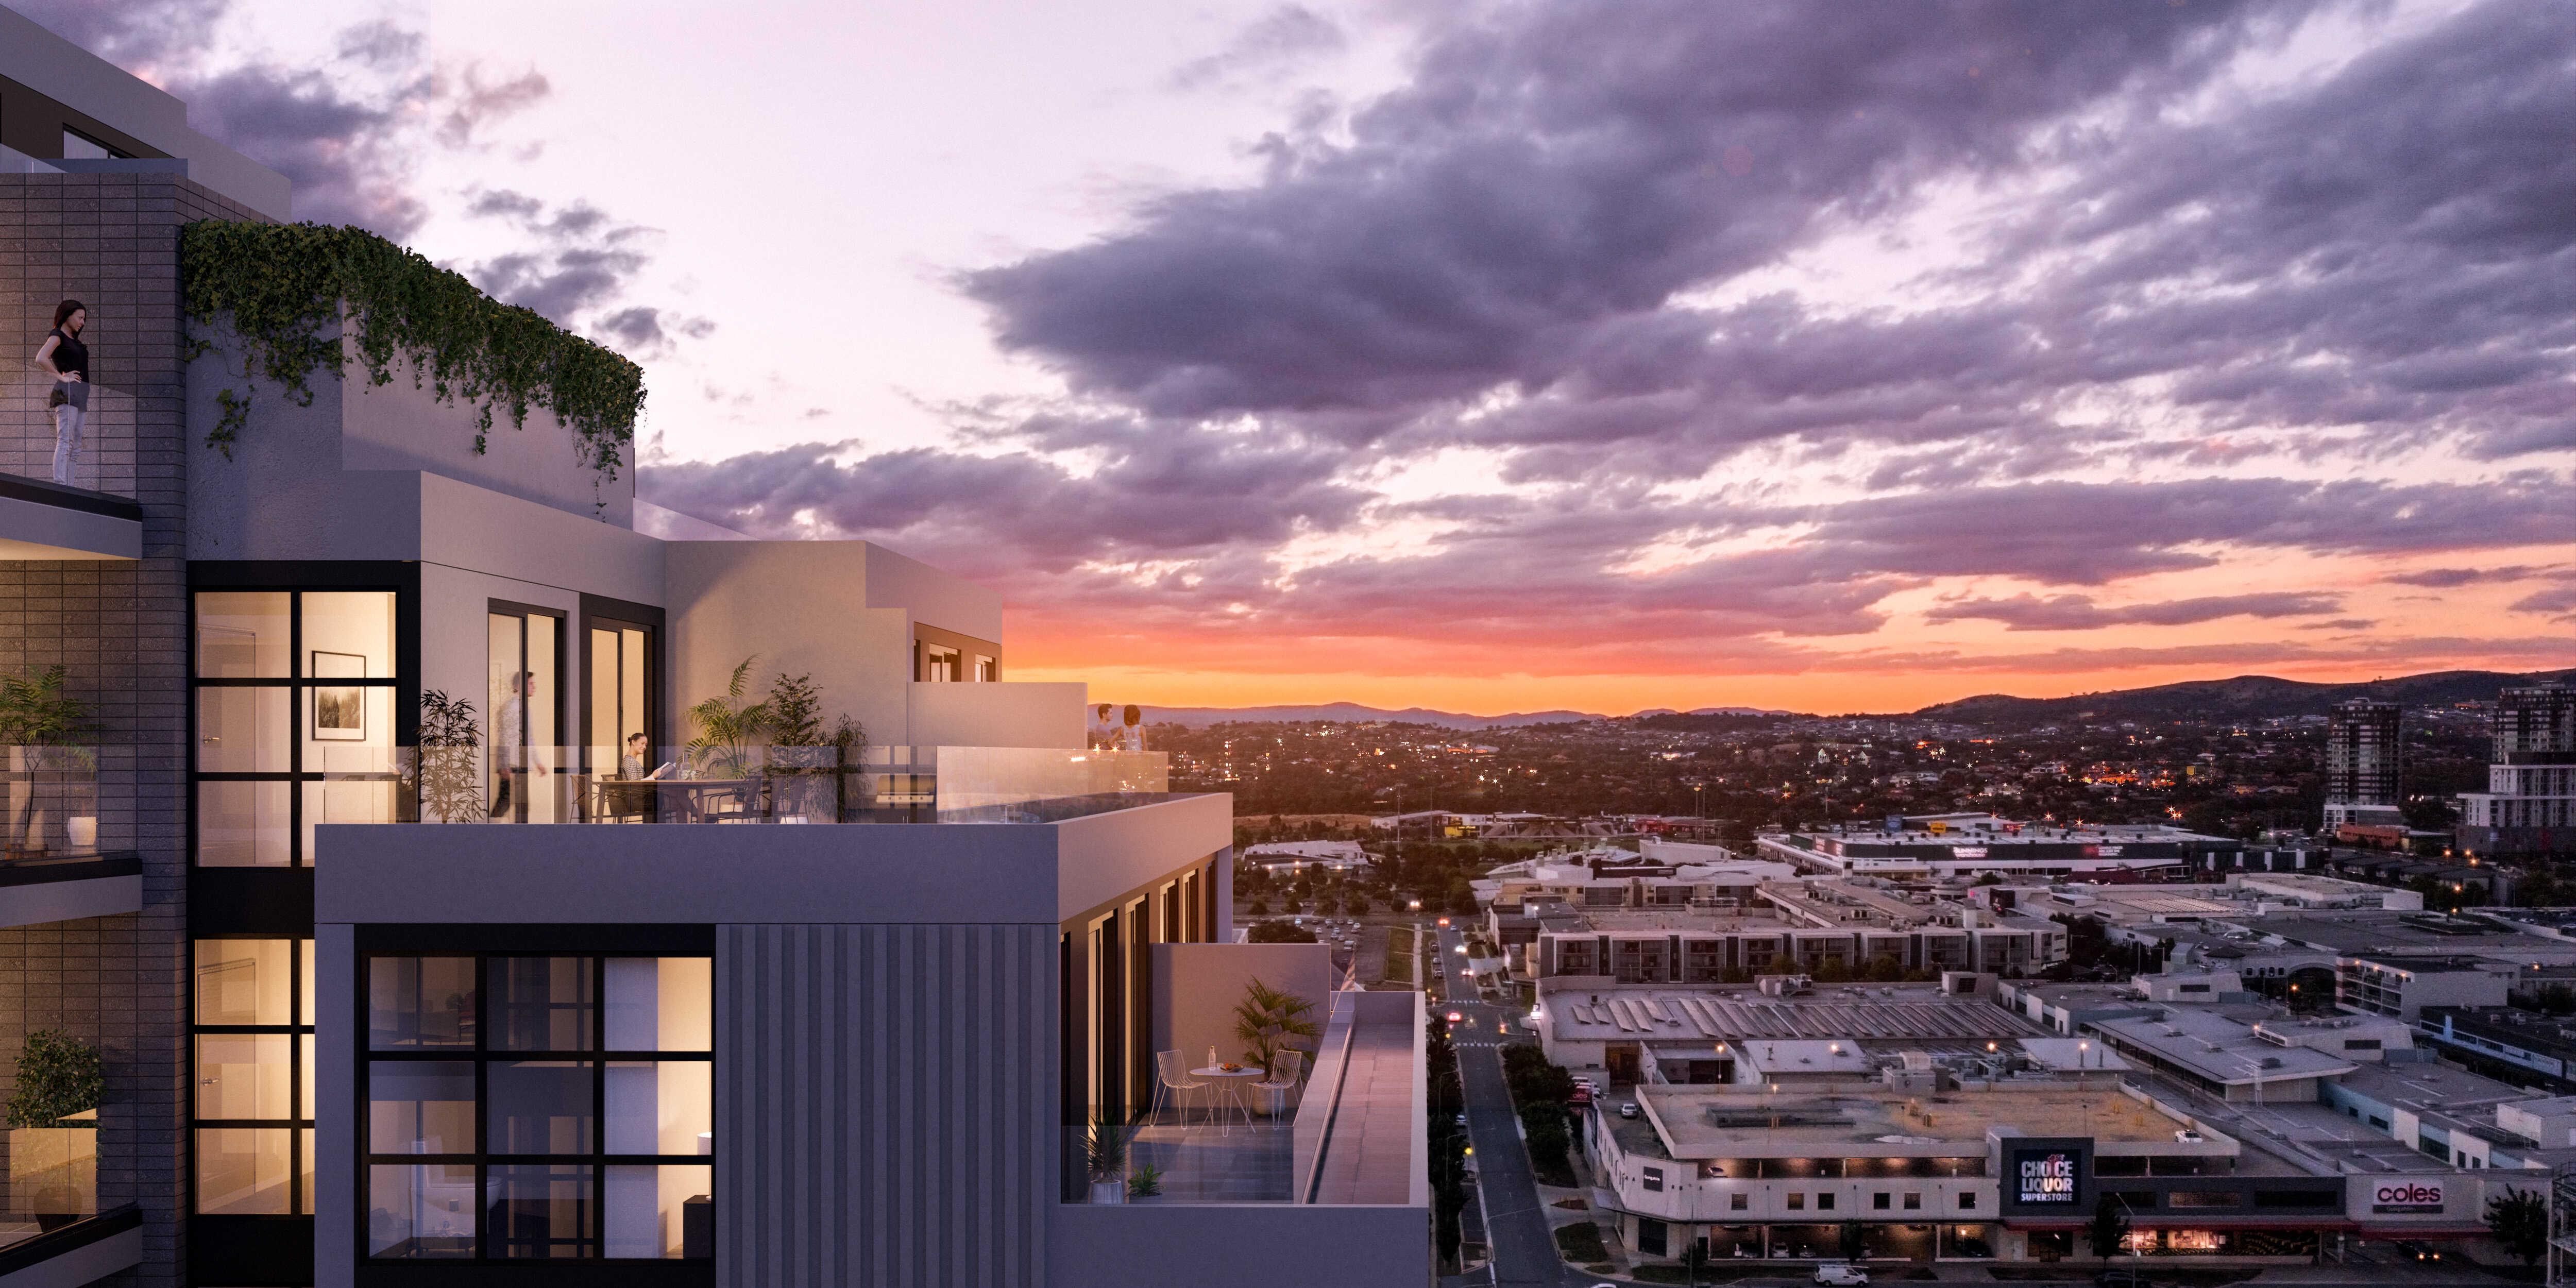 Residential Property Exterior Render - Sunset